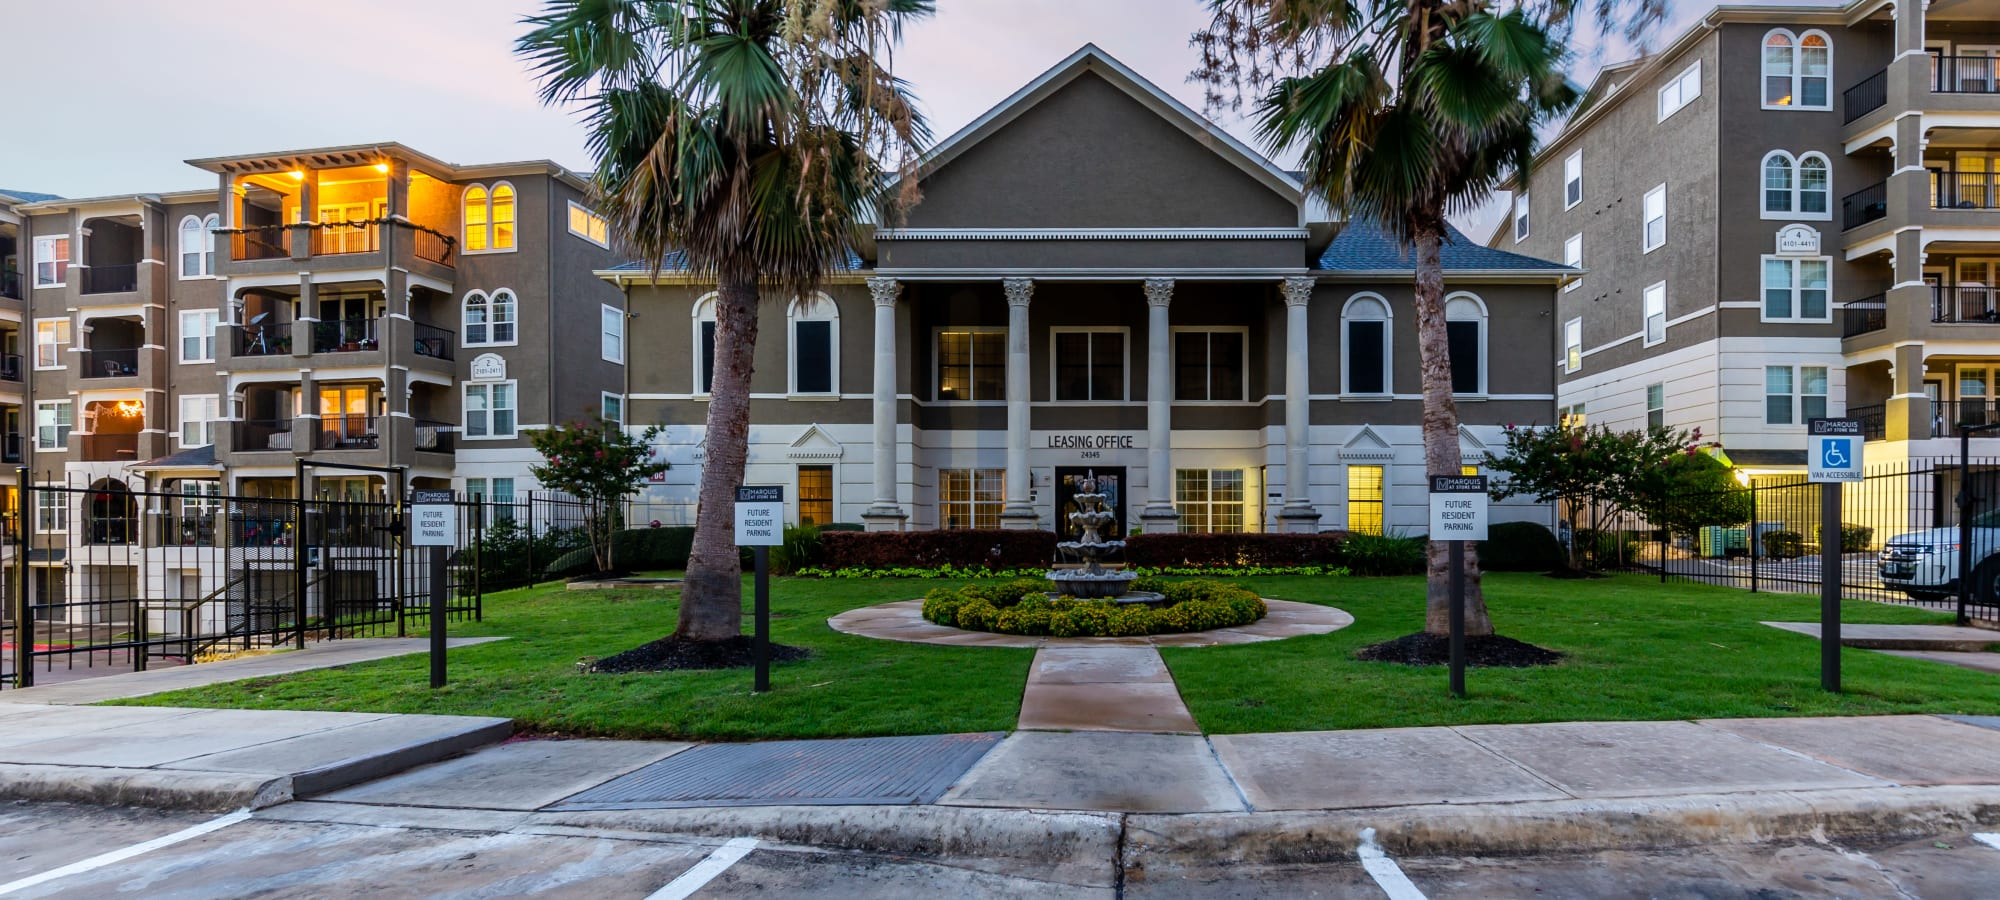 Apartments at Marquis at Stone Oak in San Antonio, Texas